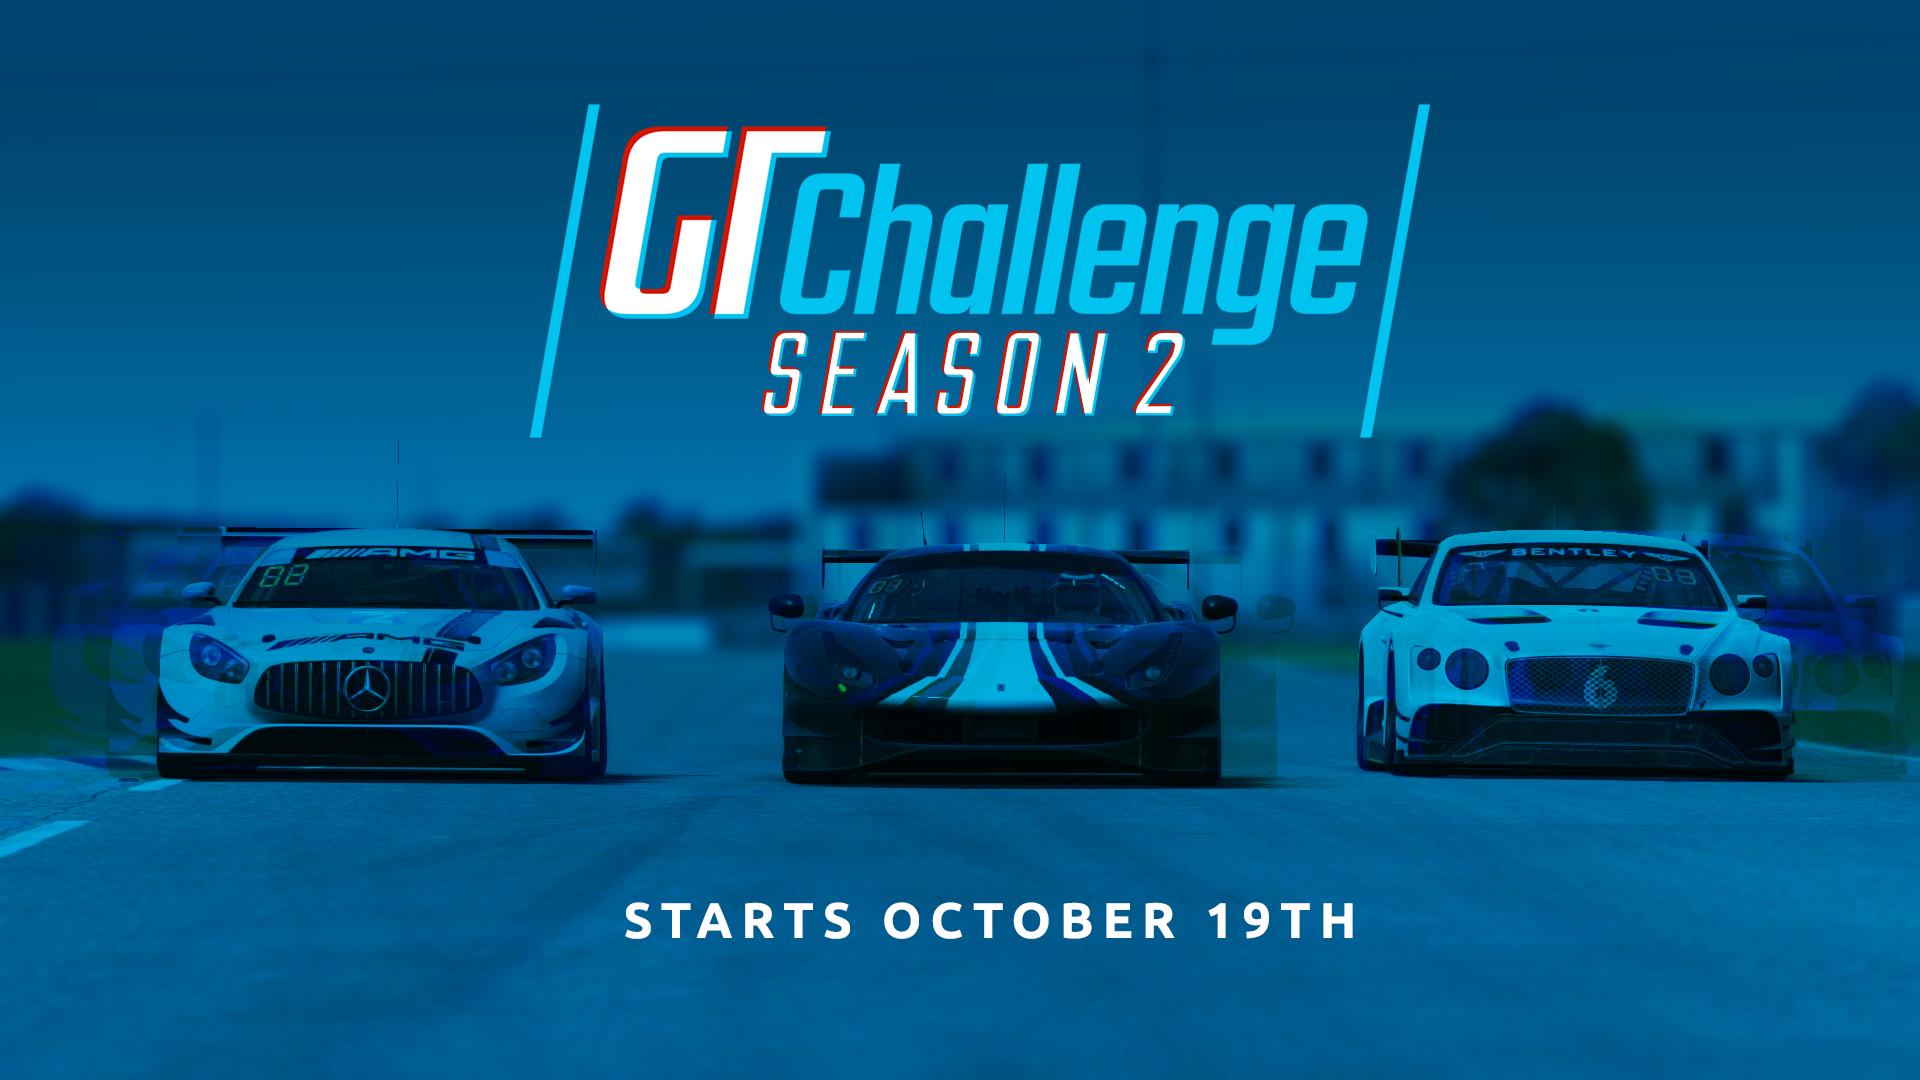 rFactor_2_GT_Challenge_Season2_WP_Header